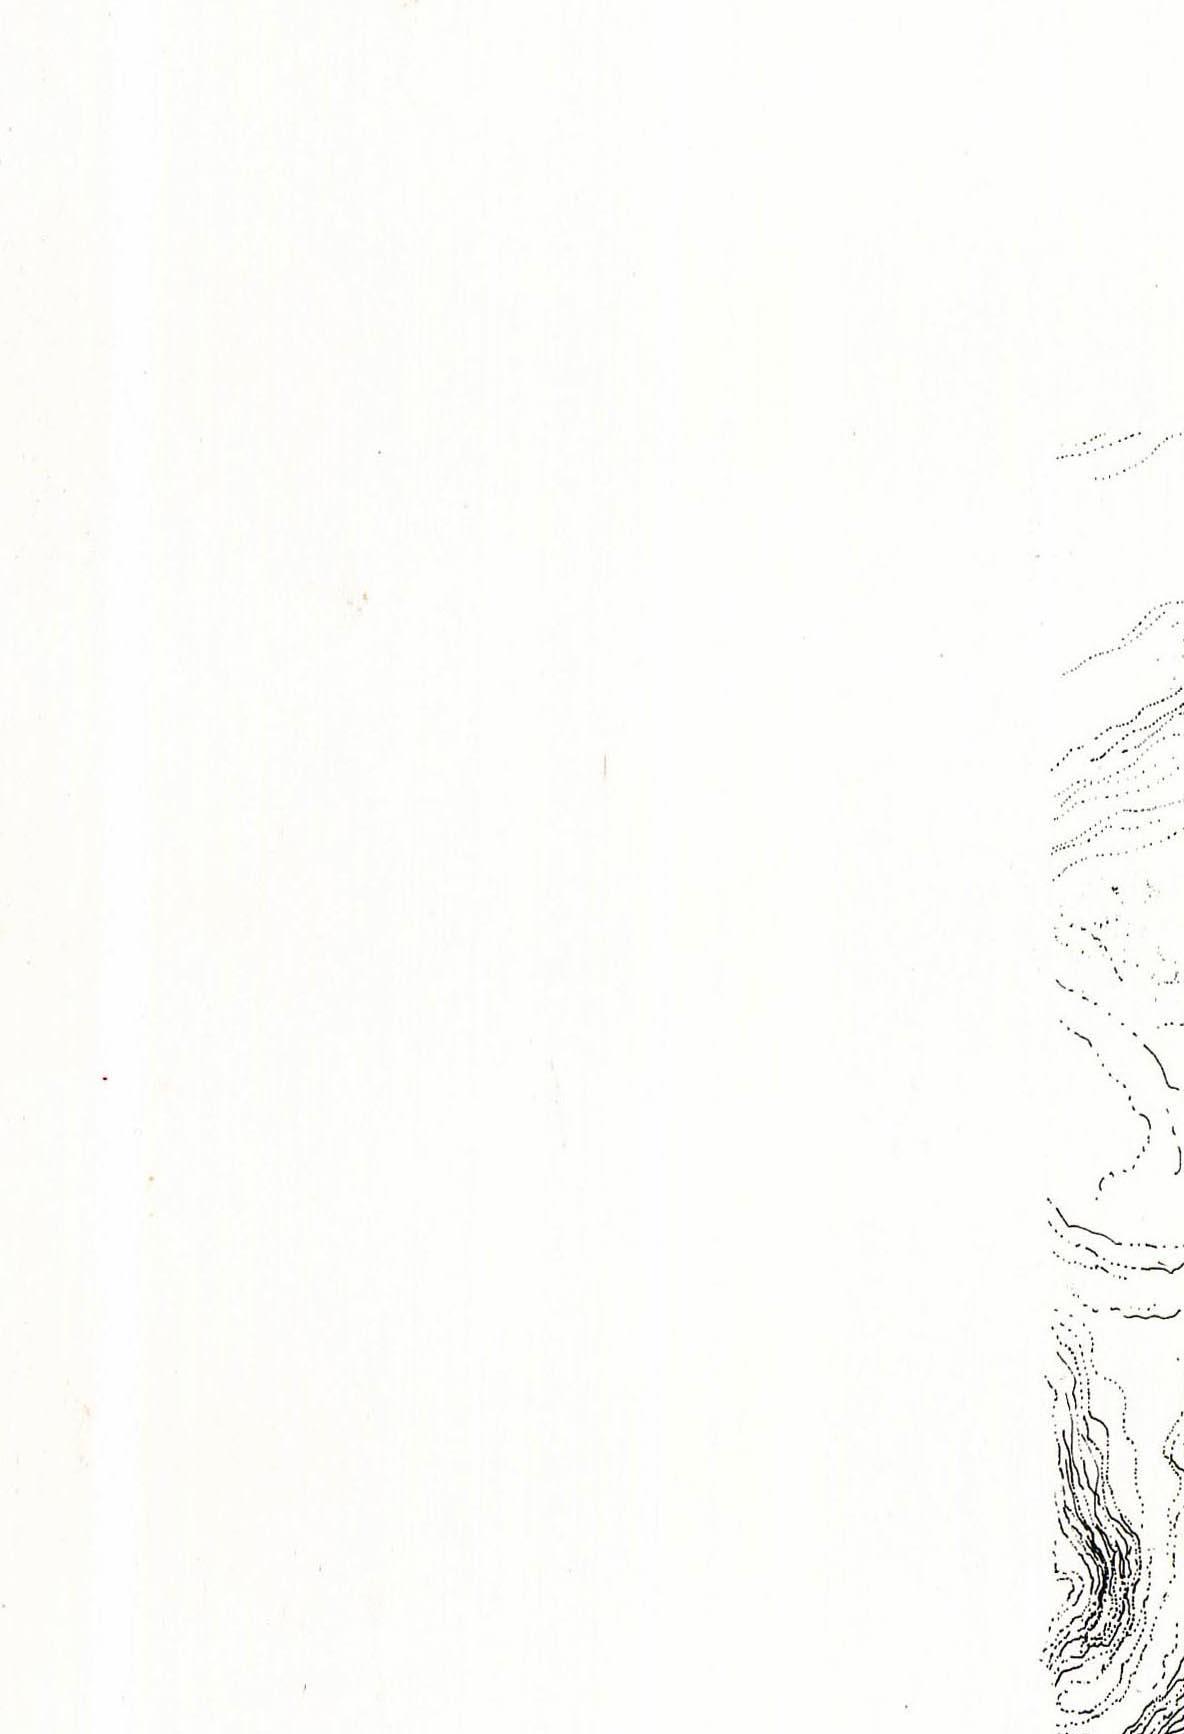 danielvillalobos-valladolid-blueprints-renaissance-i.1